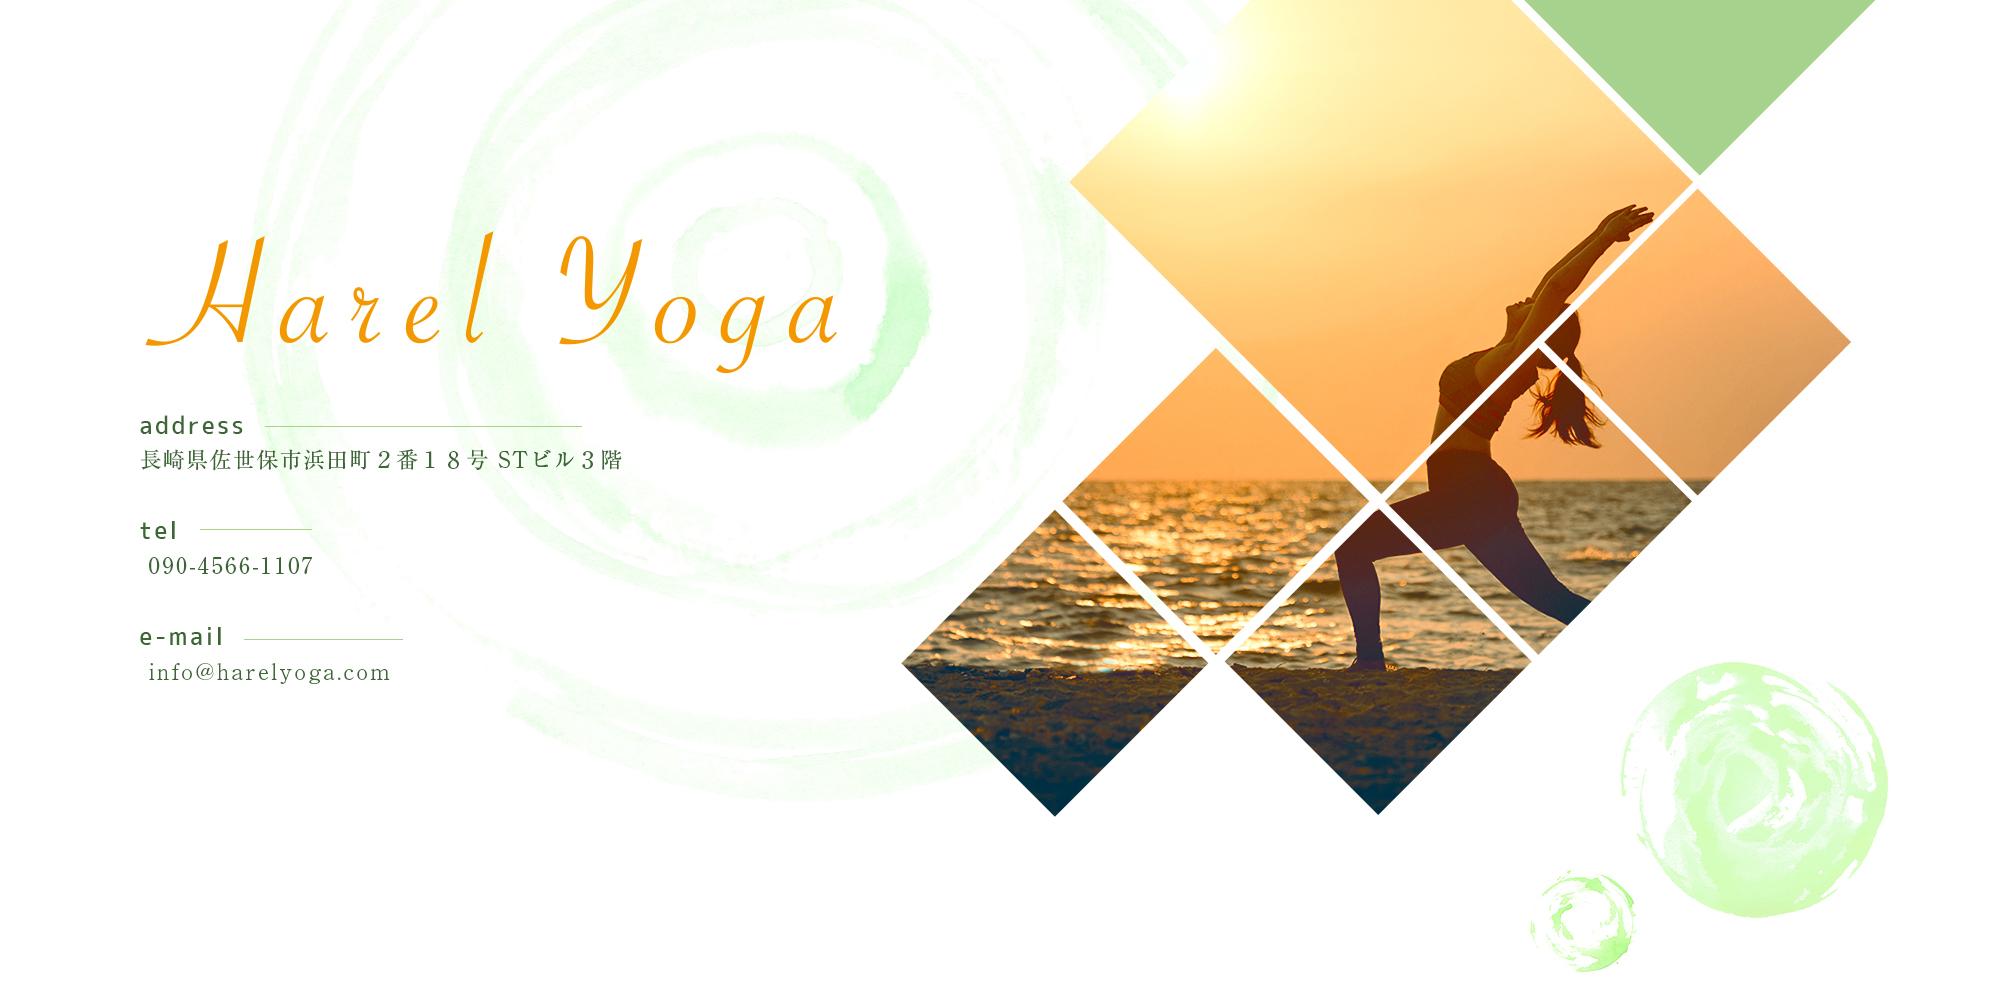 Harel Yoga